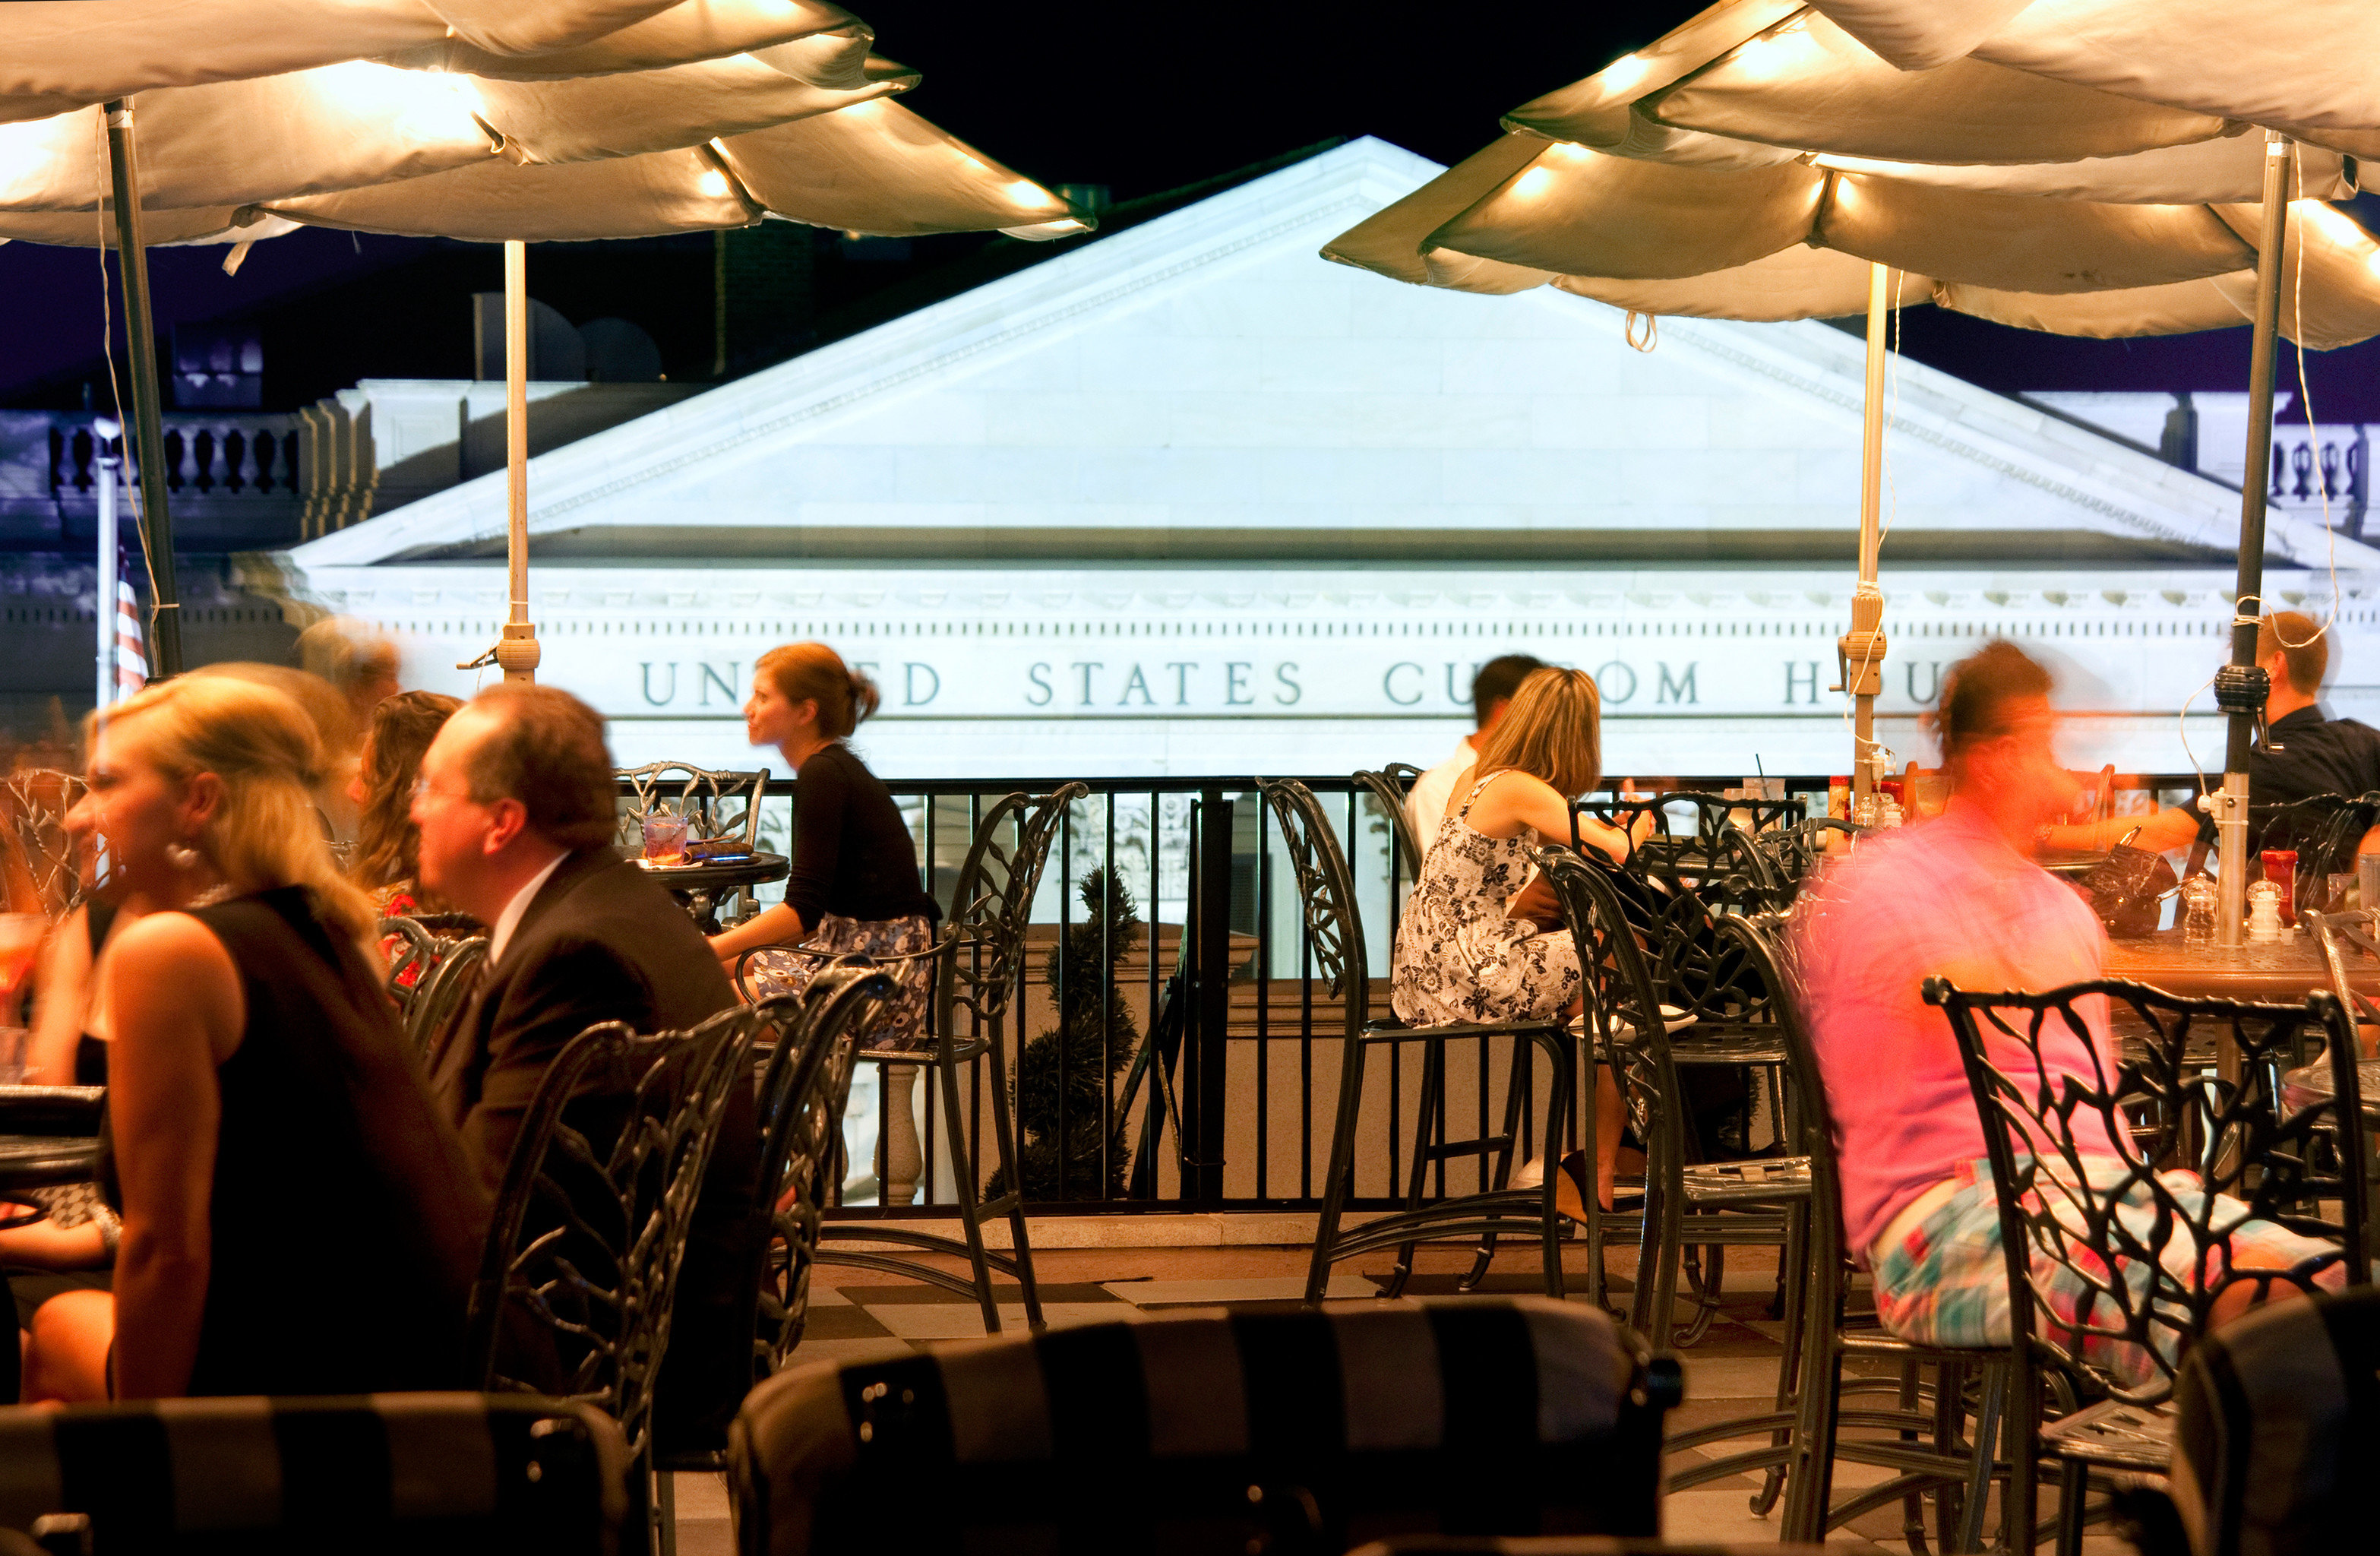 Music musician sense group restaurant Bar